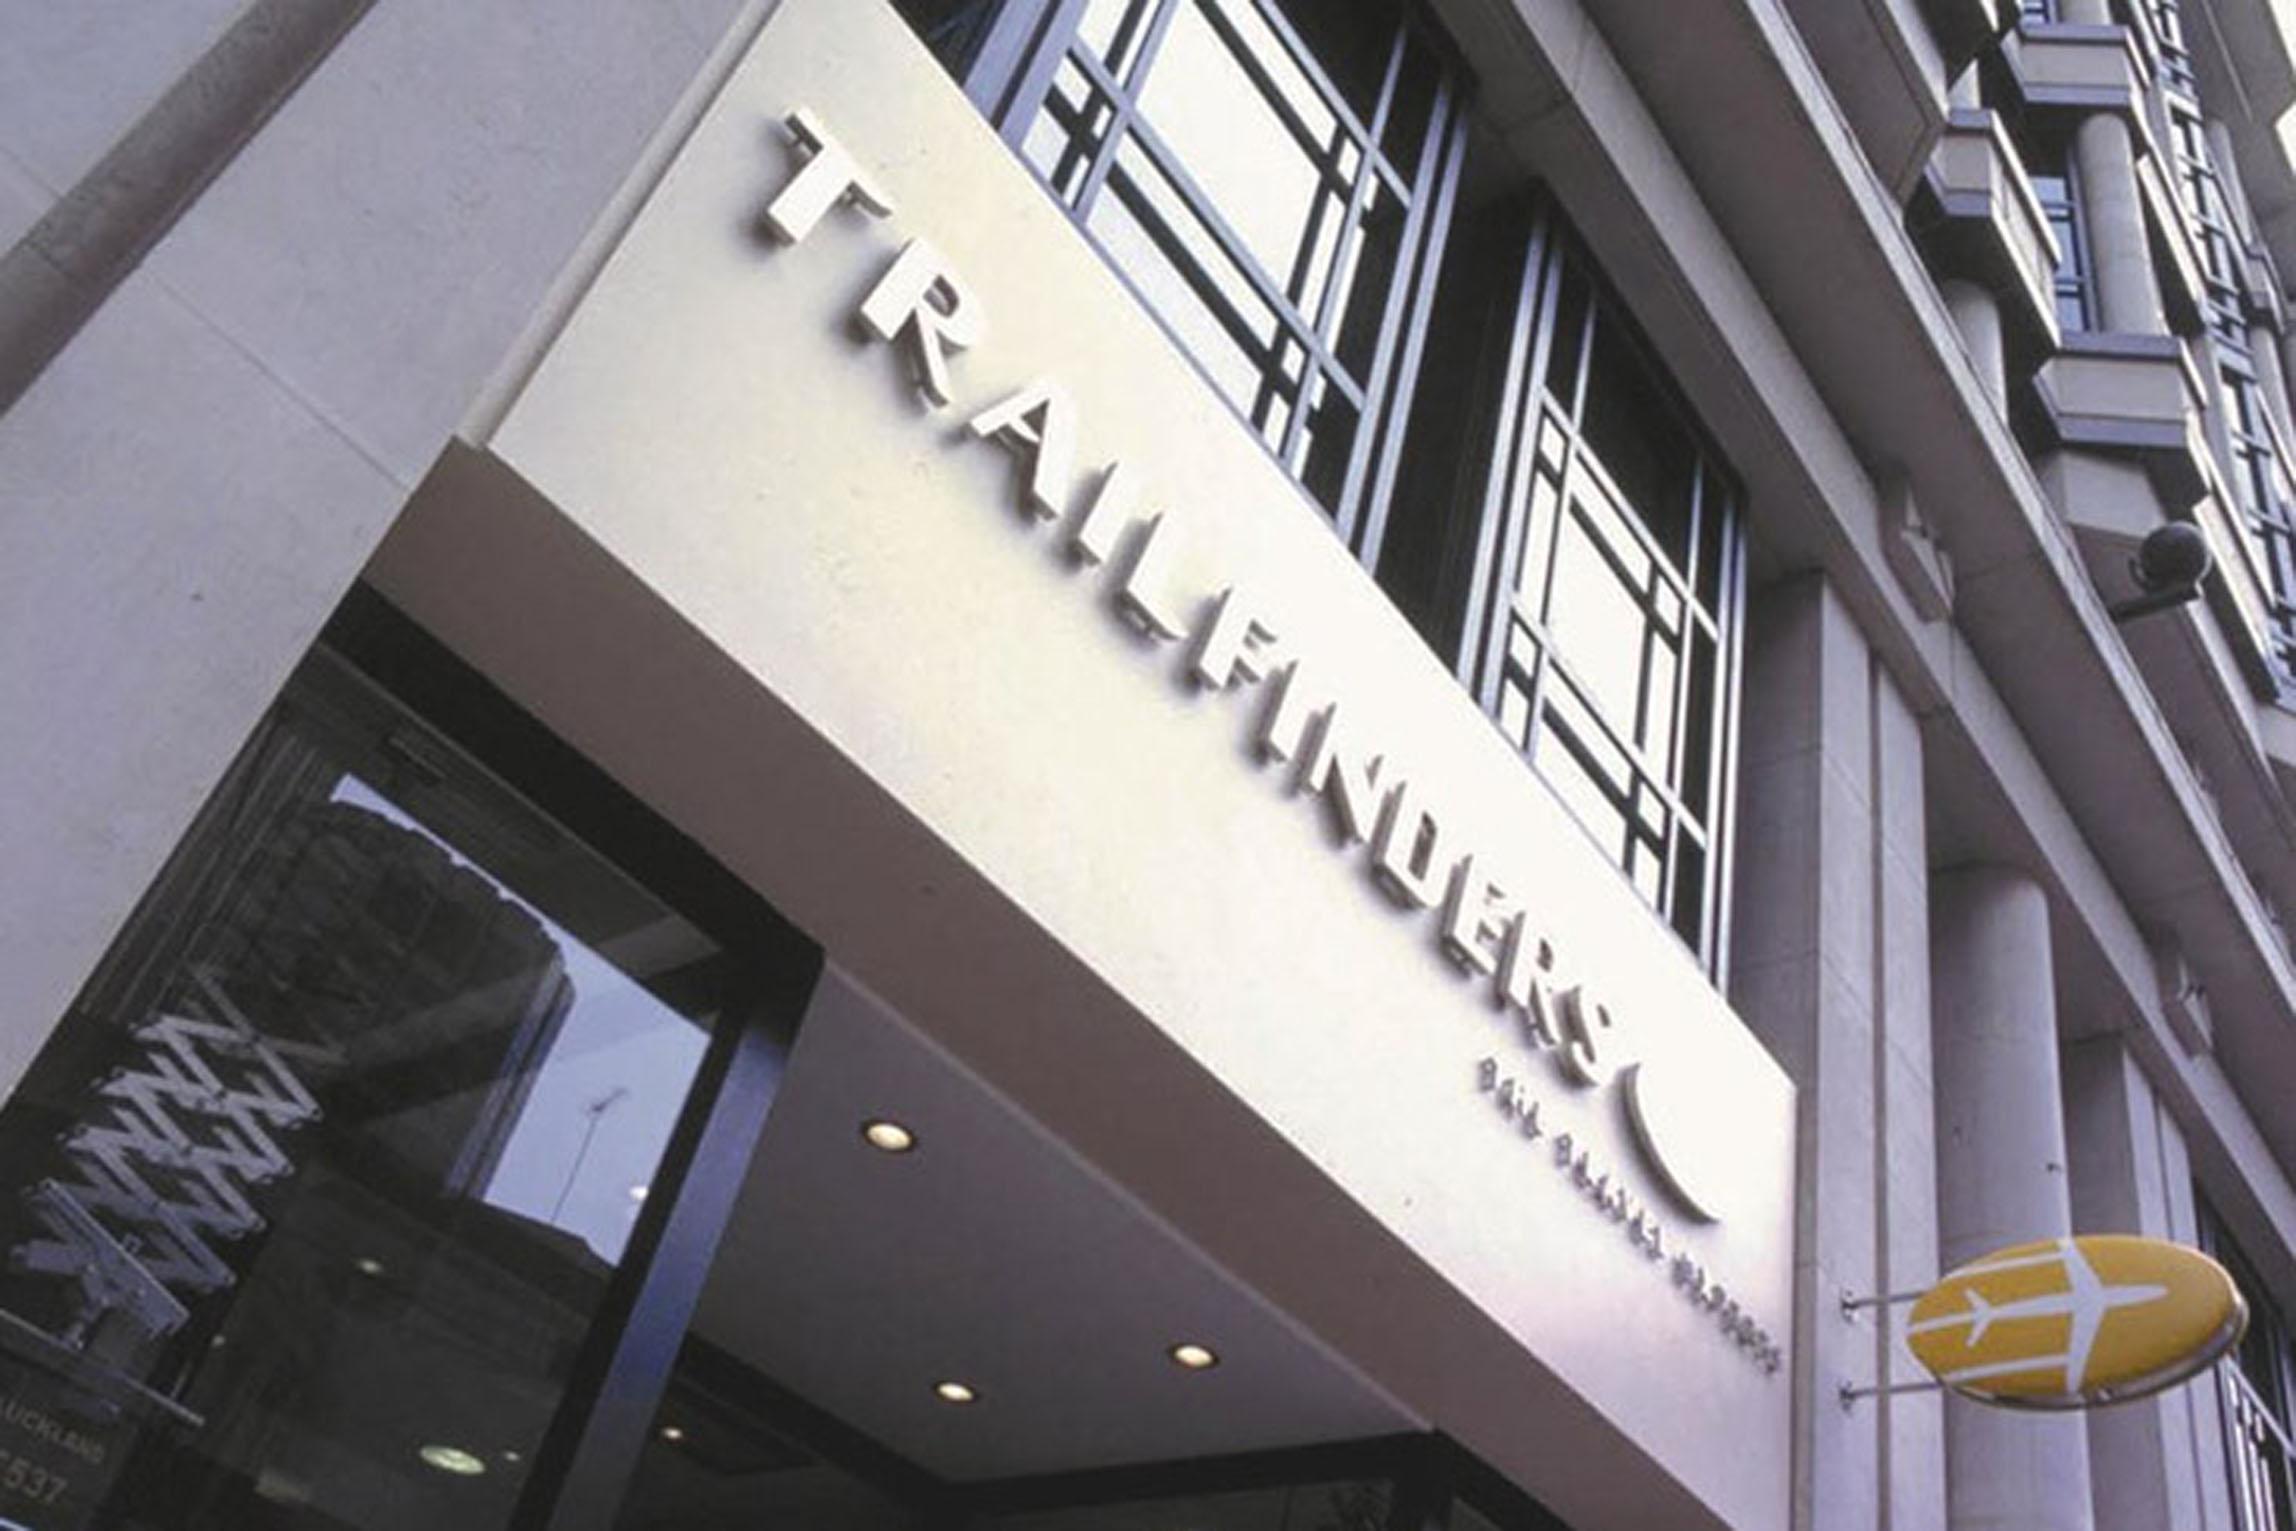 Trailfinders' London HQ